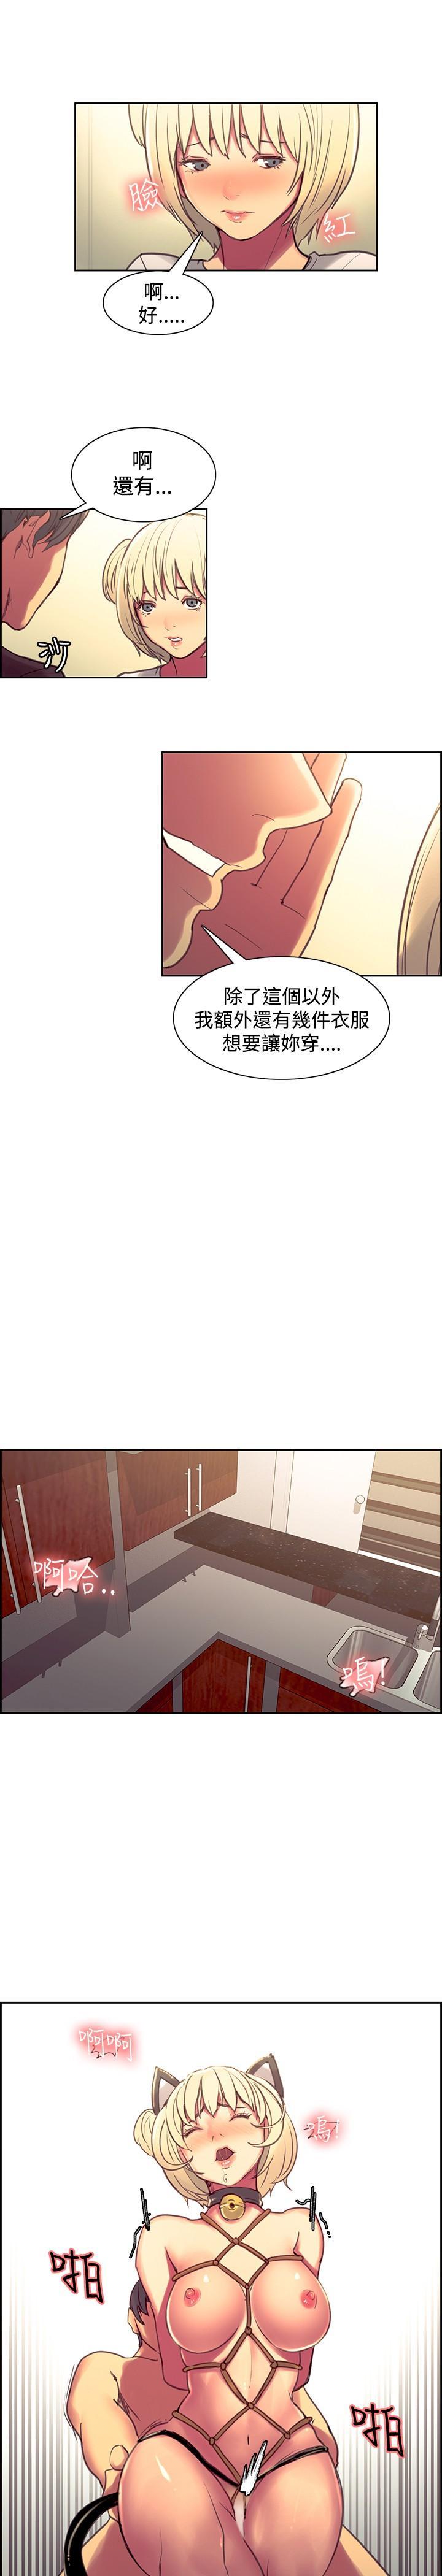 Domesticate the Housekeeper 调教家政妇 Ch.29~39 134